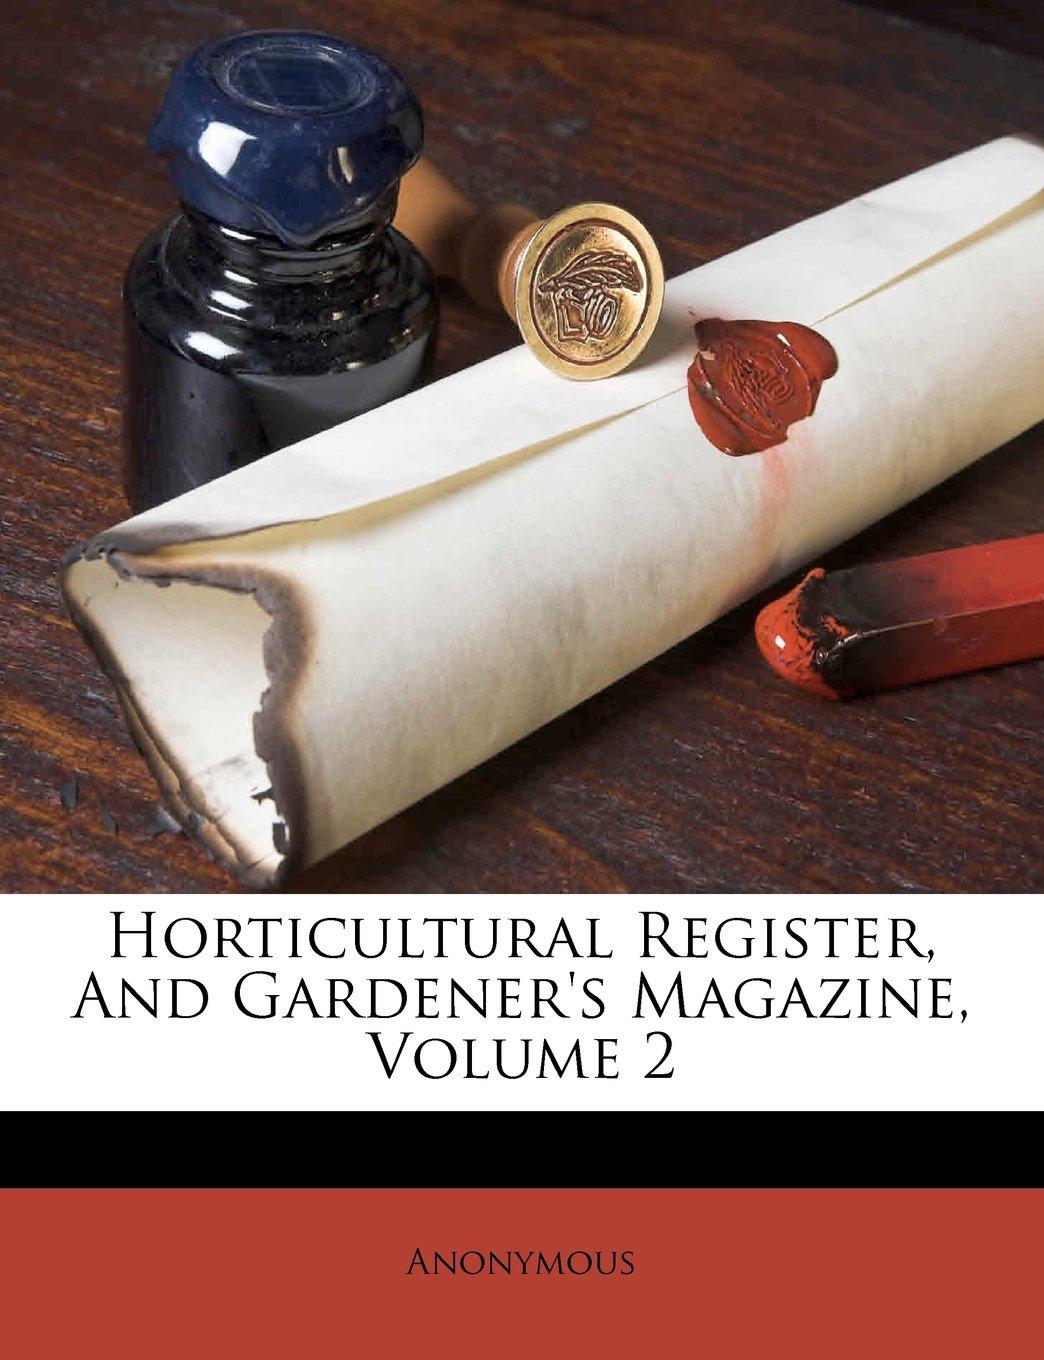 Download Horticultural Register, And Gardener's Magazine, Volume 2 ebook